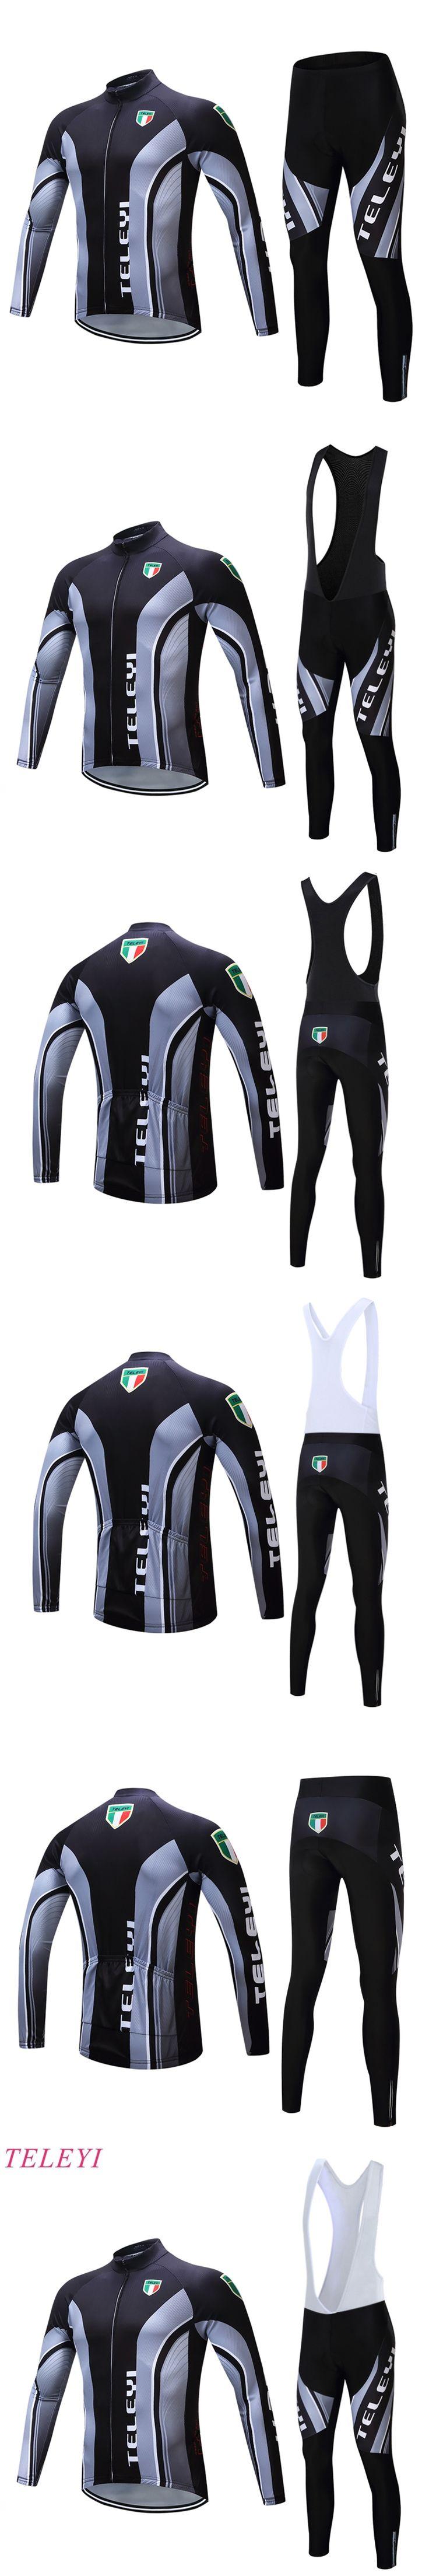 2016 Hot Sale Men's Sportswear Spring Autumn Pro Cycling Clothing Ciclismo Motocross Bike Jersey Long Sleeve Mtb Shirt +Gel Pad